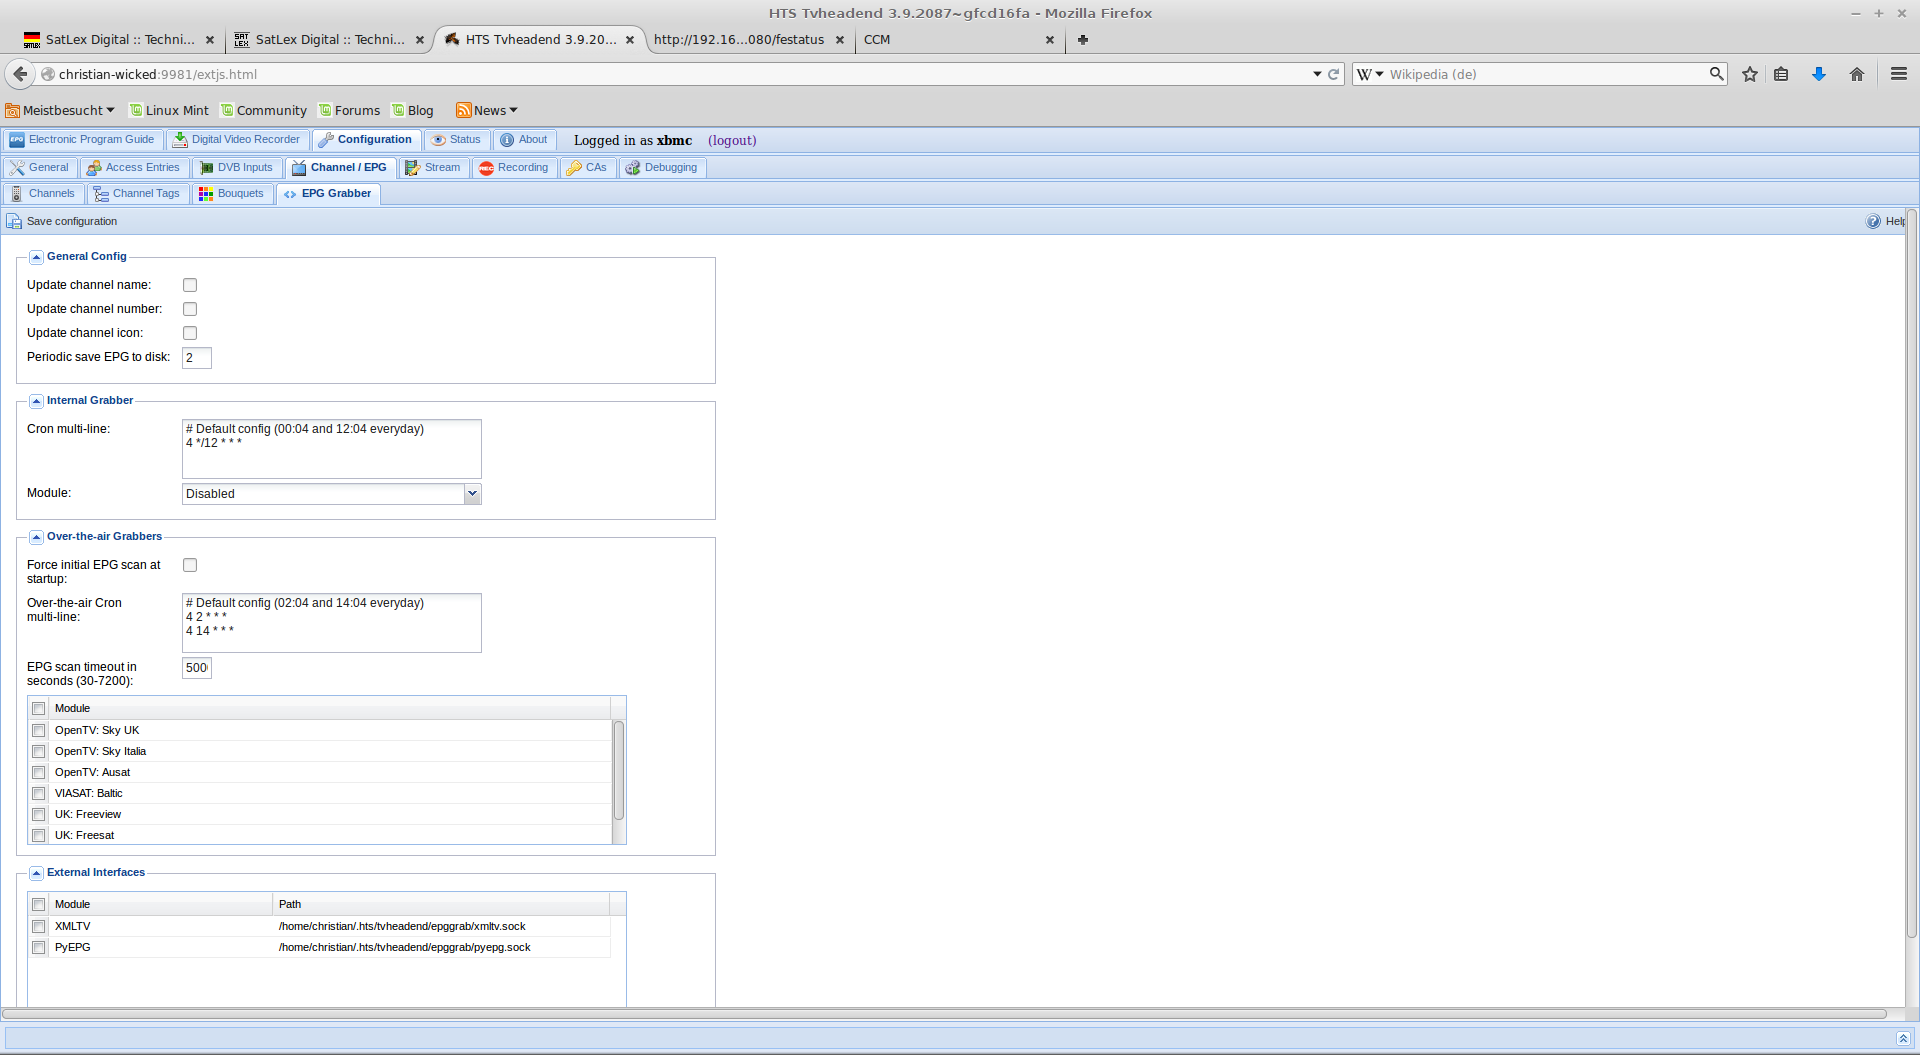 Cccam To Oscam - Converter 1 2 Download - prioritythreads